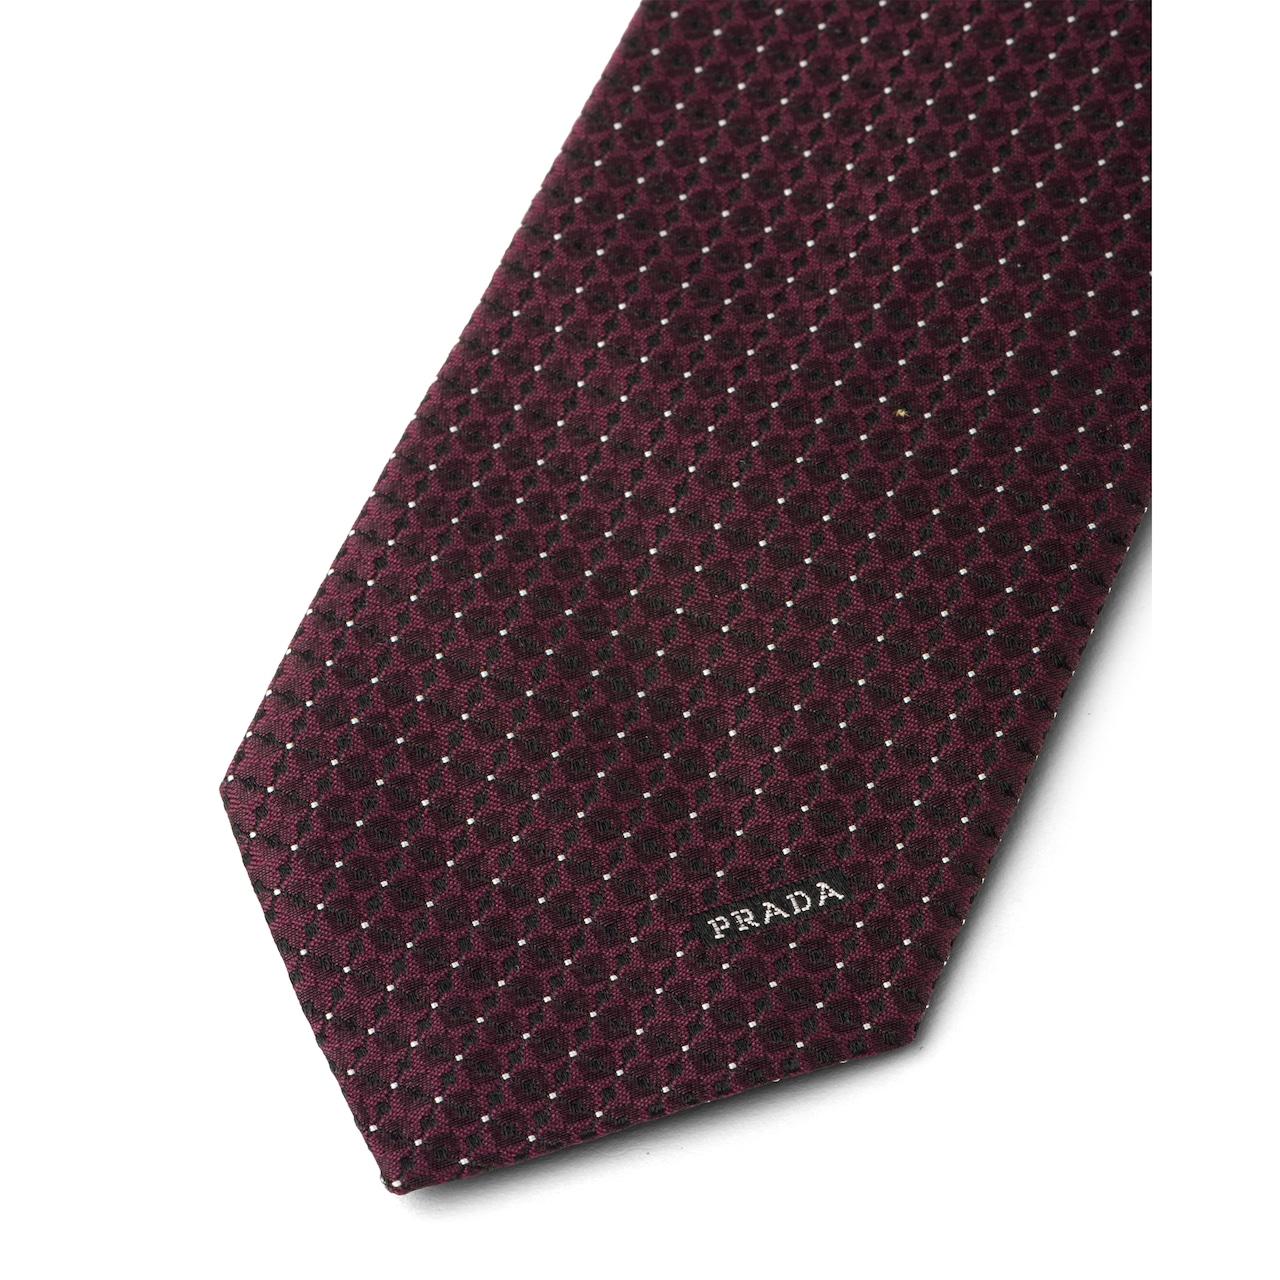 Prada 丝质斜纹领带 3